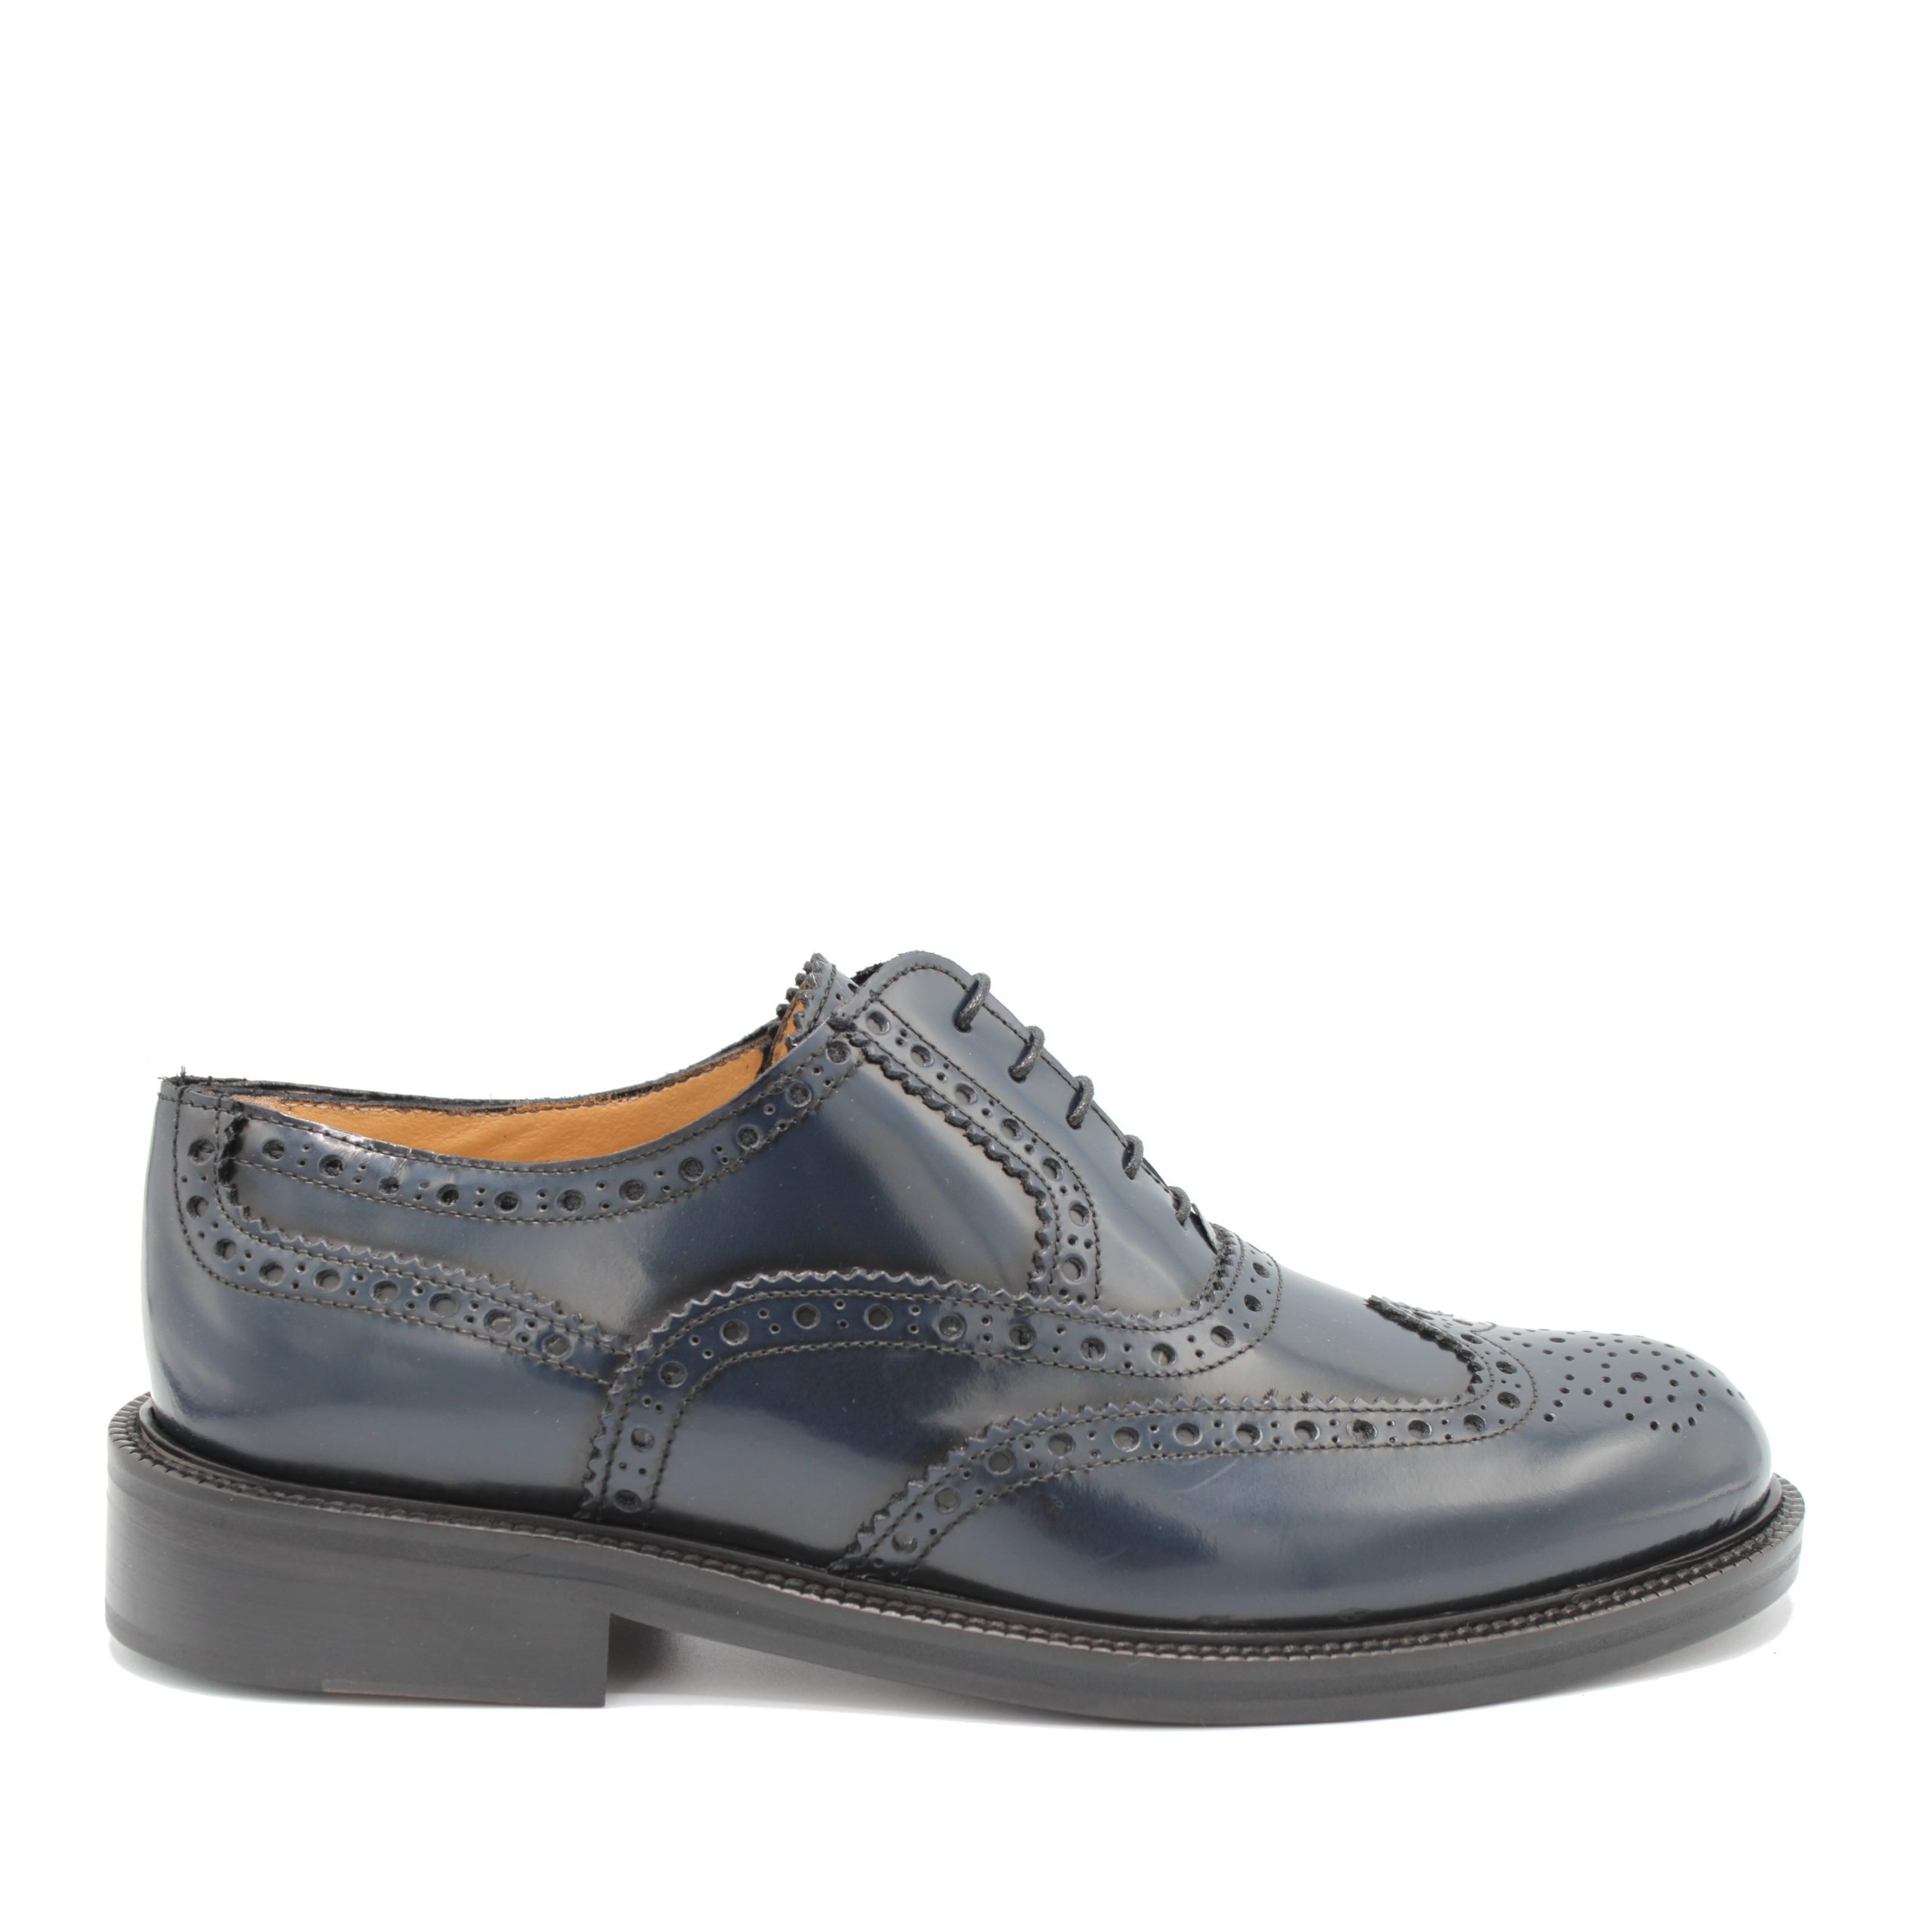 Saxone of Scotland Men's Spazzolato Leather Laced Brogue Shoe Blue 080_blue - EU40.5/US7.5